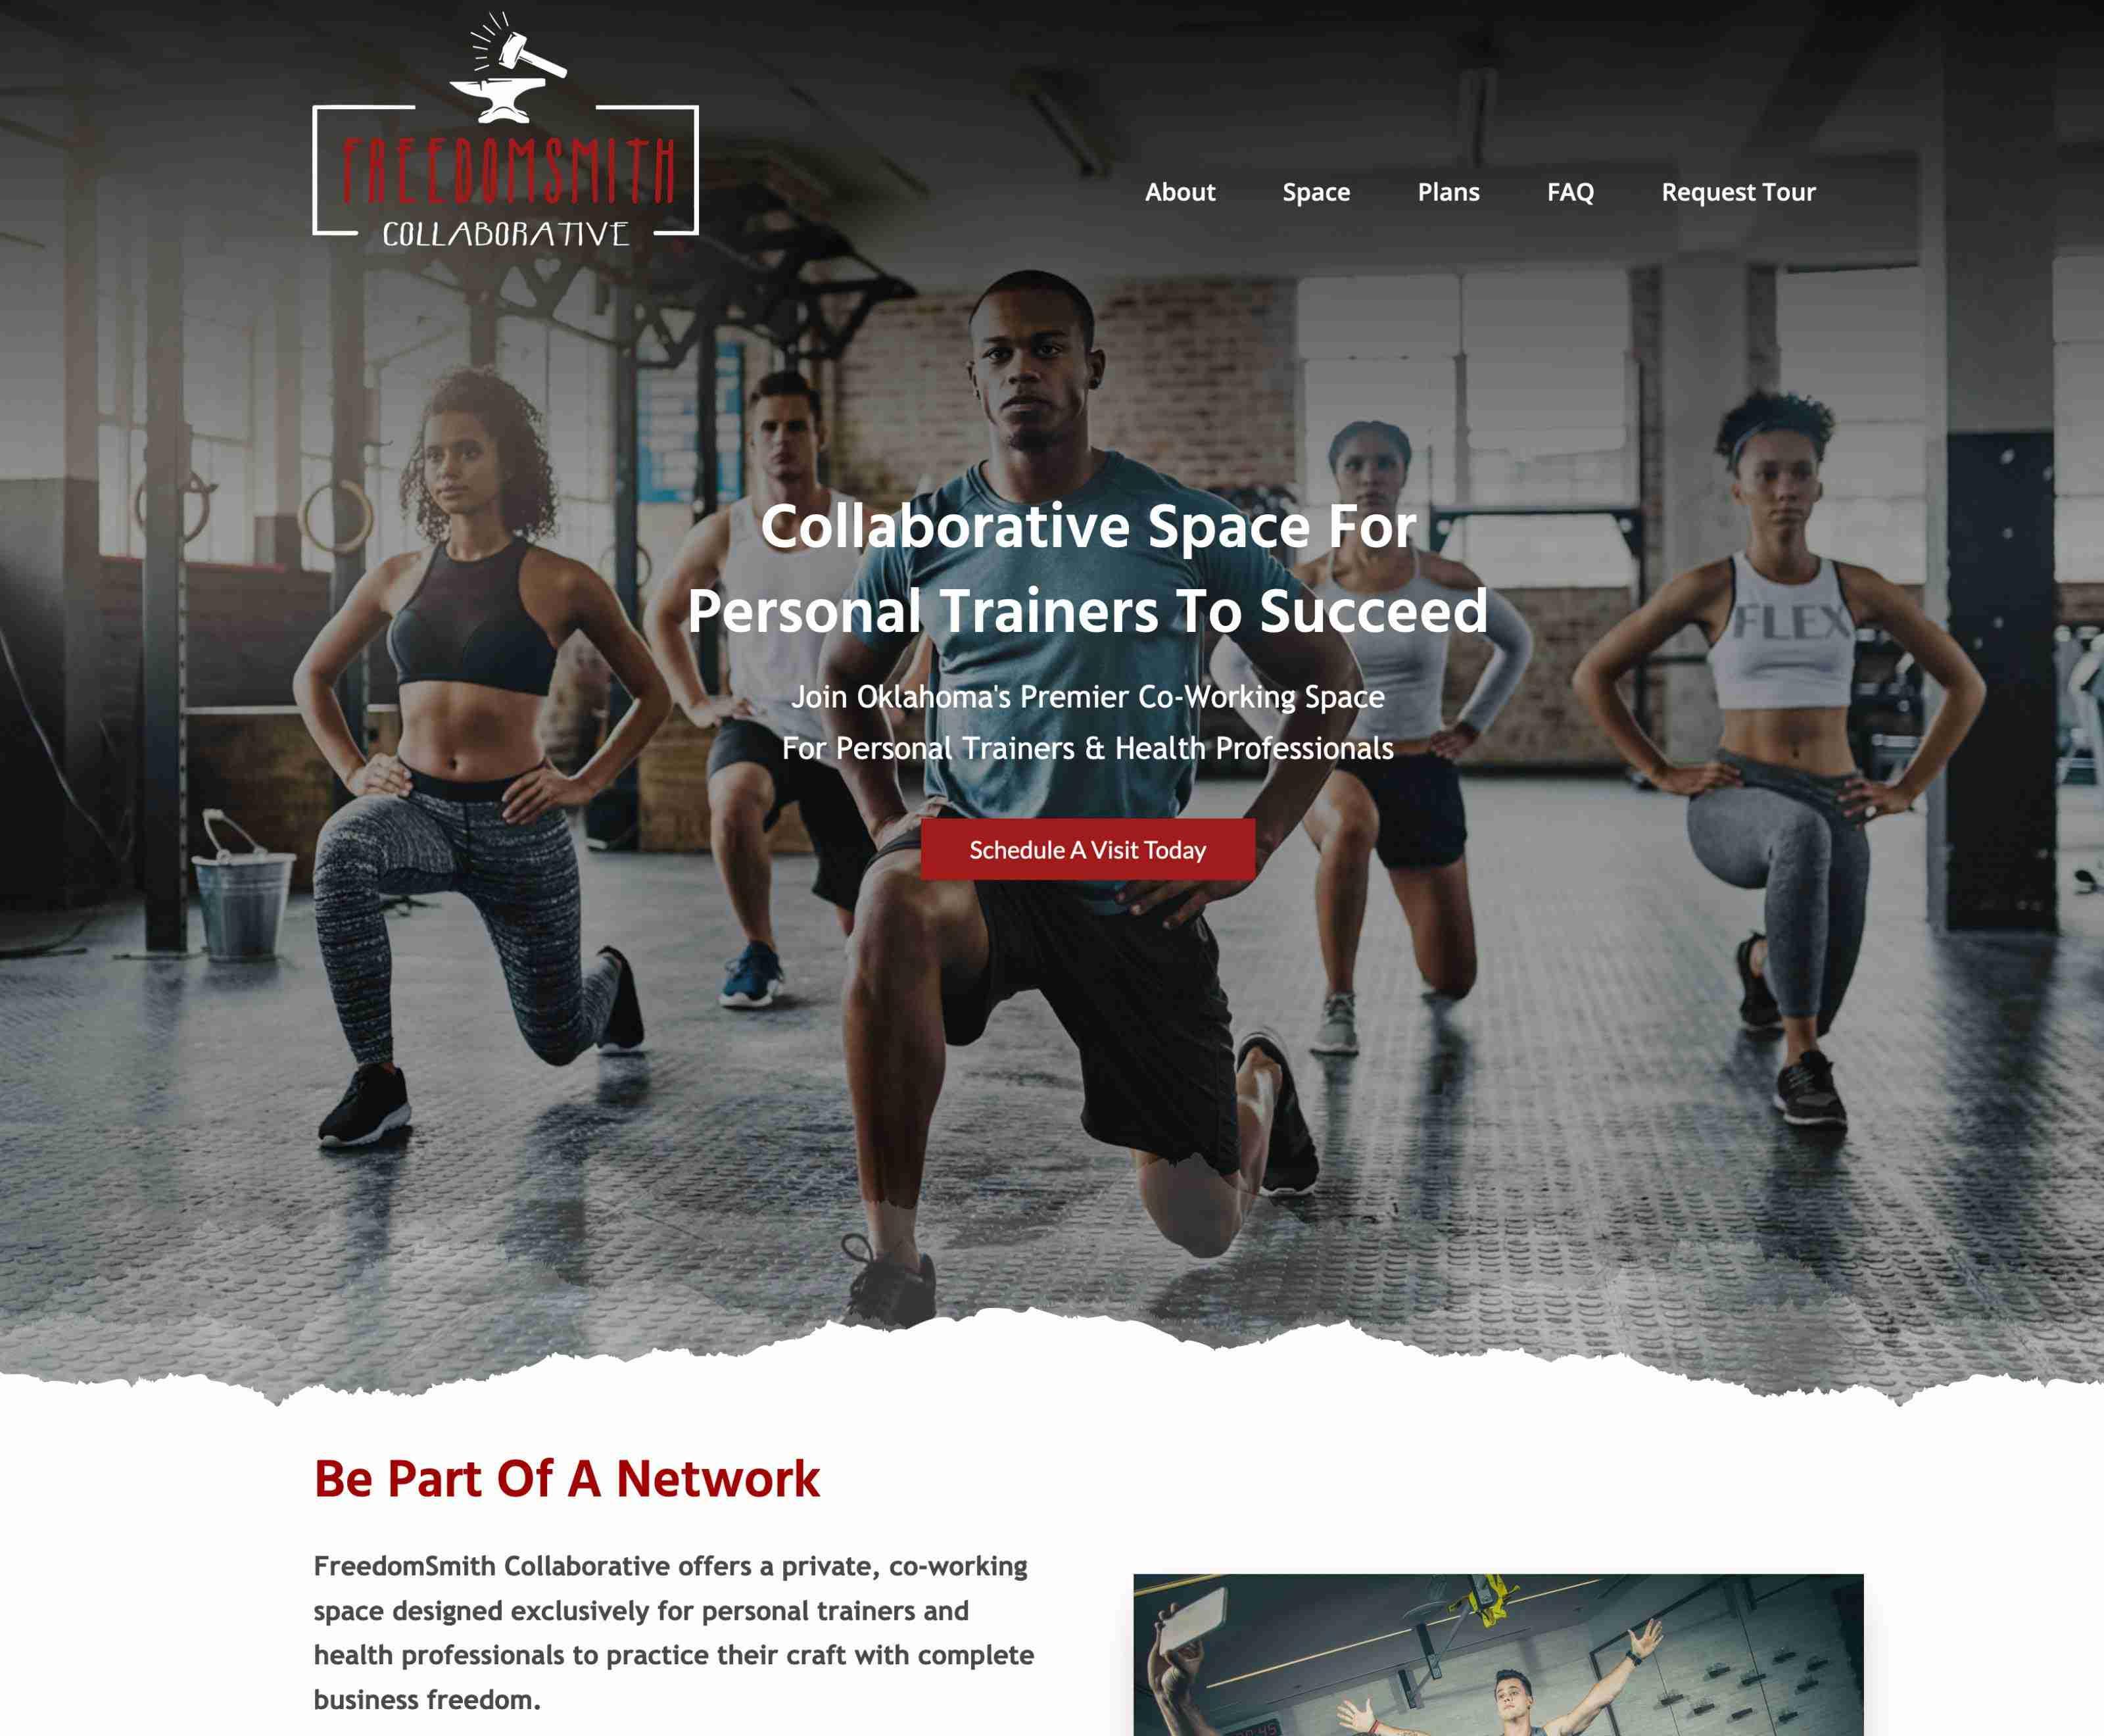 Freedomsmith Collaborative